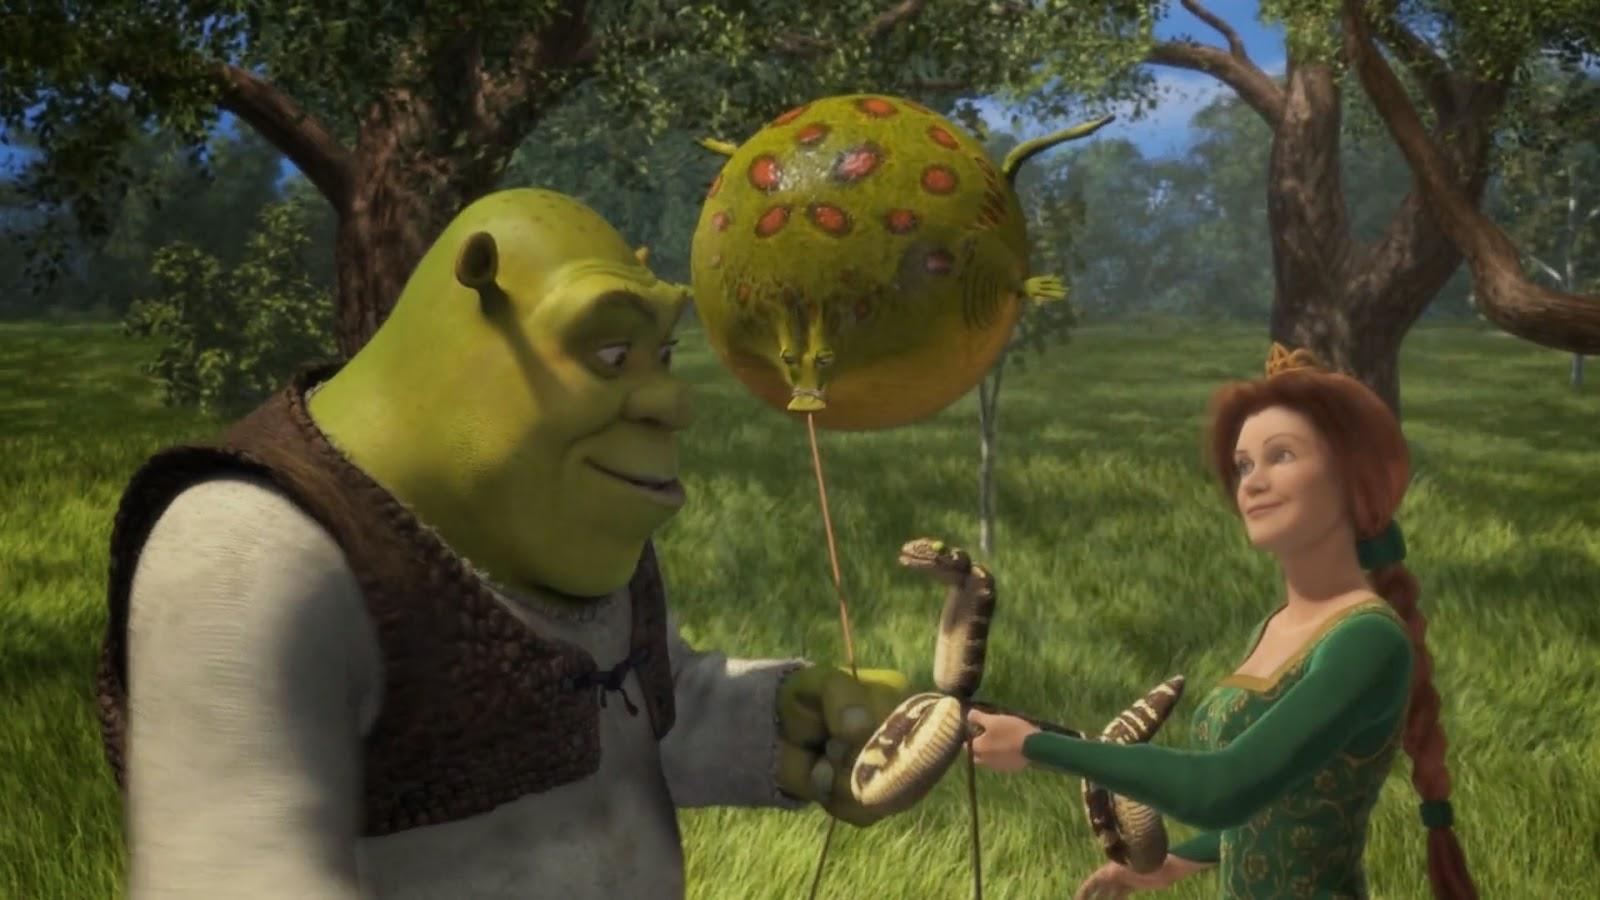 Shrek Fiona Human | www.imgkid.com - The Image Kid Has It!